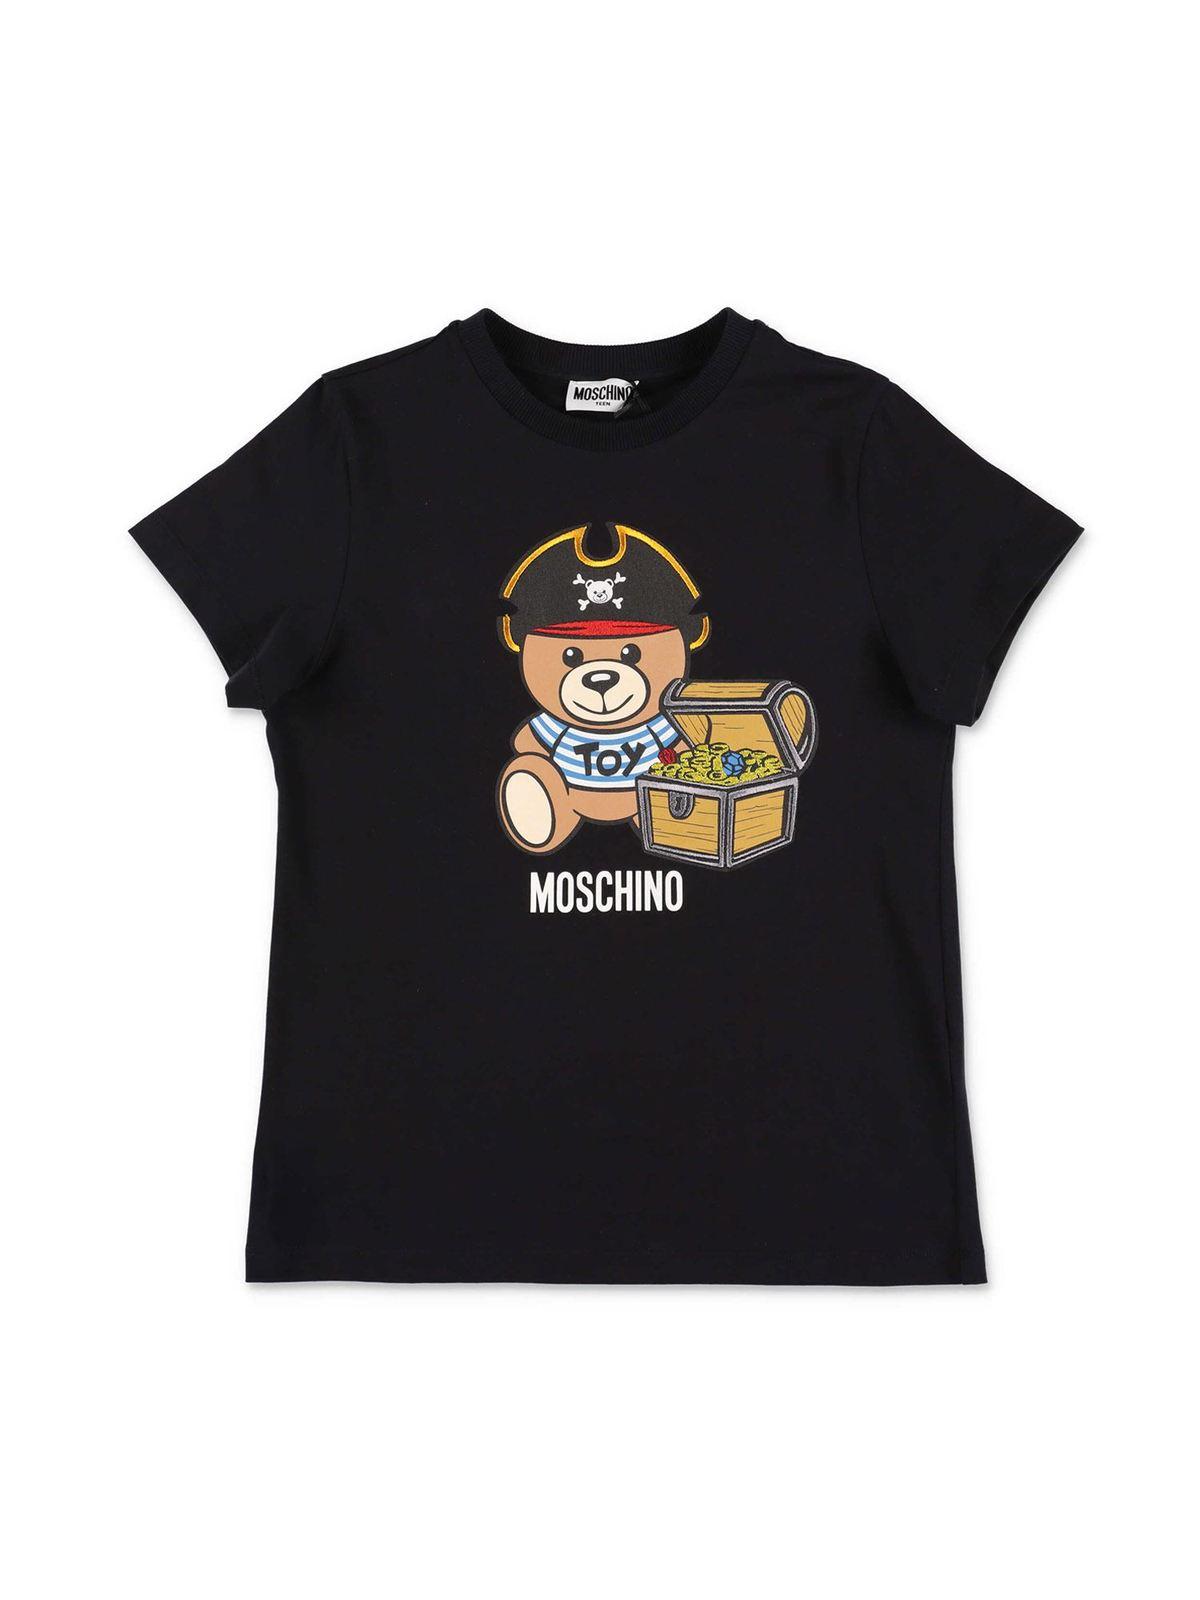 Moschino PIRATE TEDY BEAR T-SHIRT IN BLACK